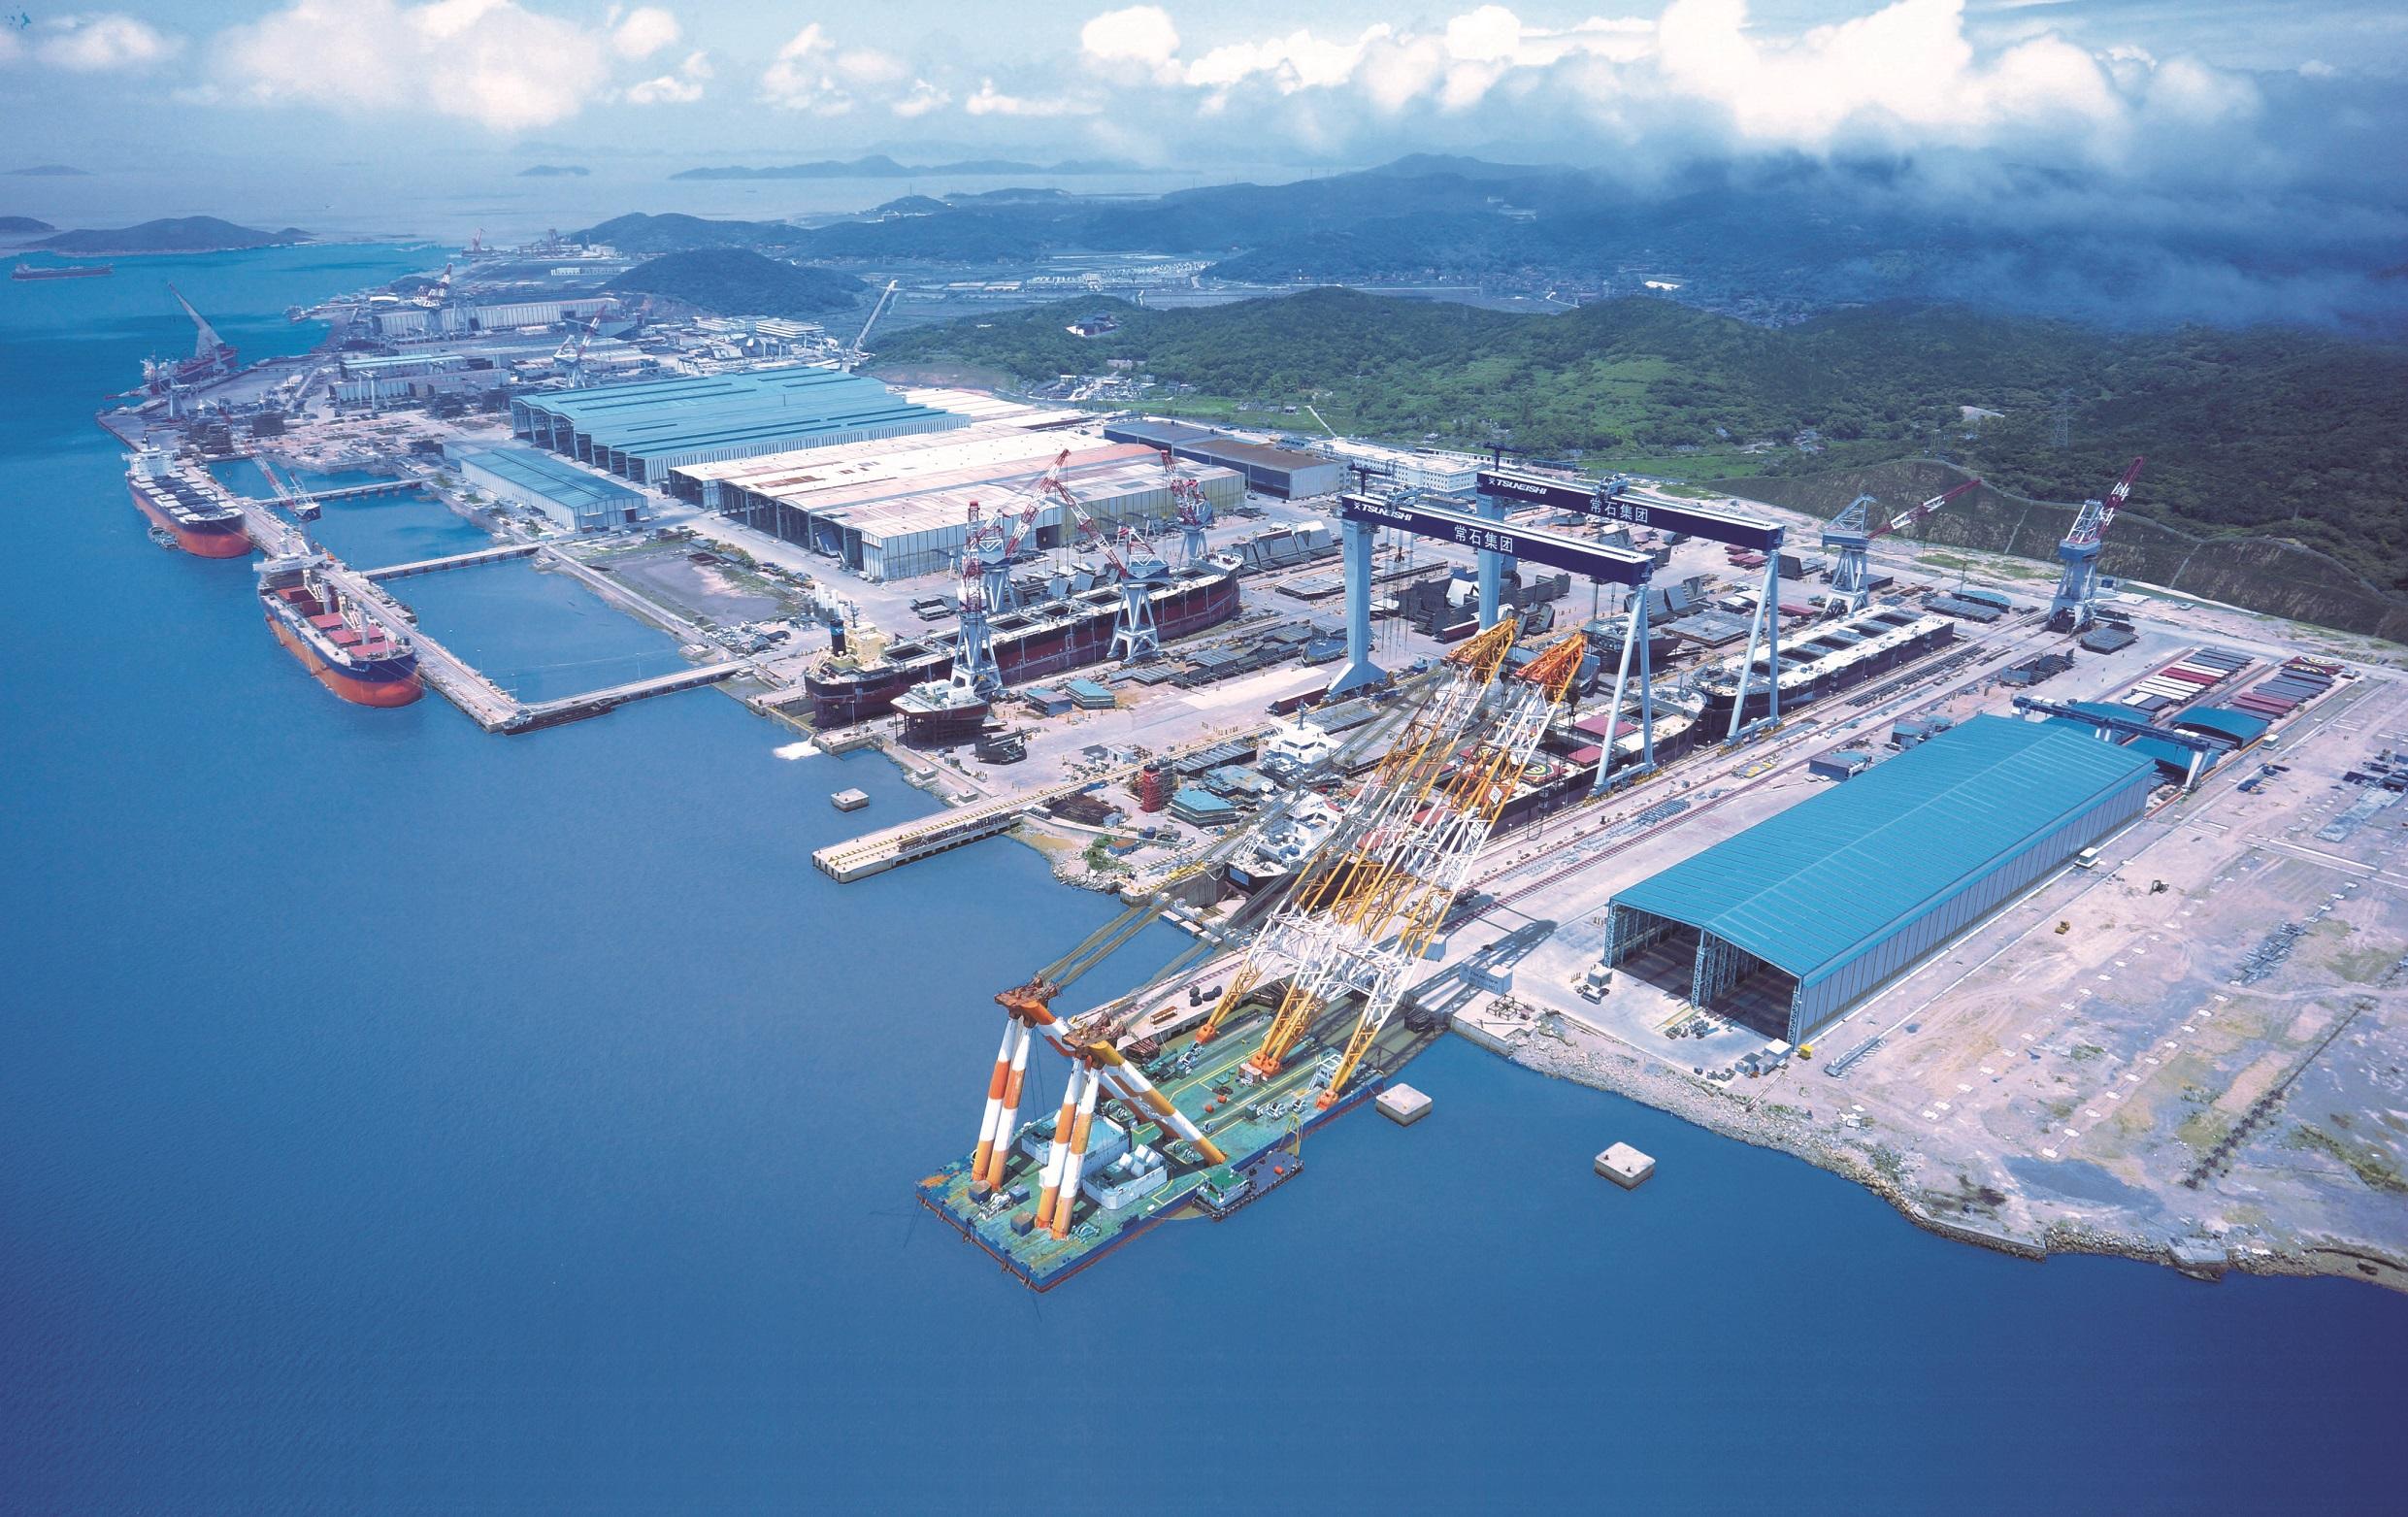 TSUNEISHI GROUP (ZHOUSHAN) SHIPBUILDING is added  to China's shipbuilding white list